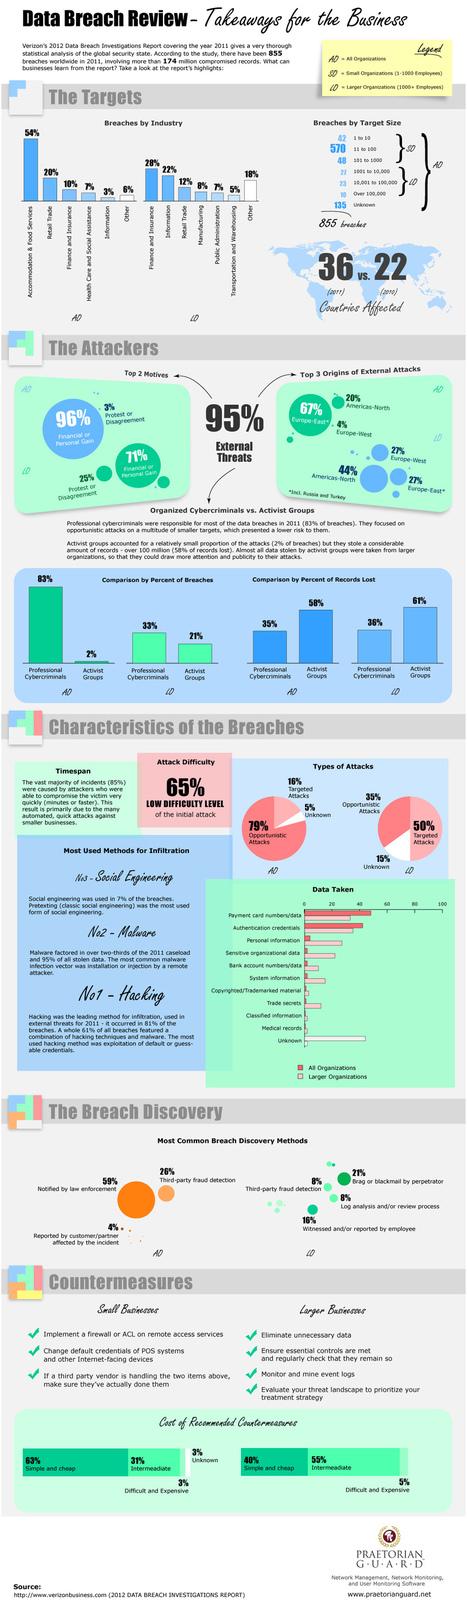 INFOGRAPHIC: : Data Breach Review | CloudTweaks | Cloud Central | Scoop.it